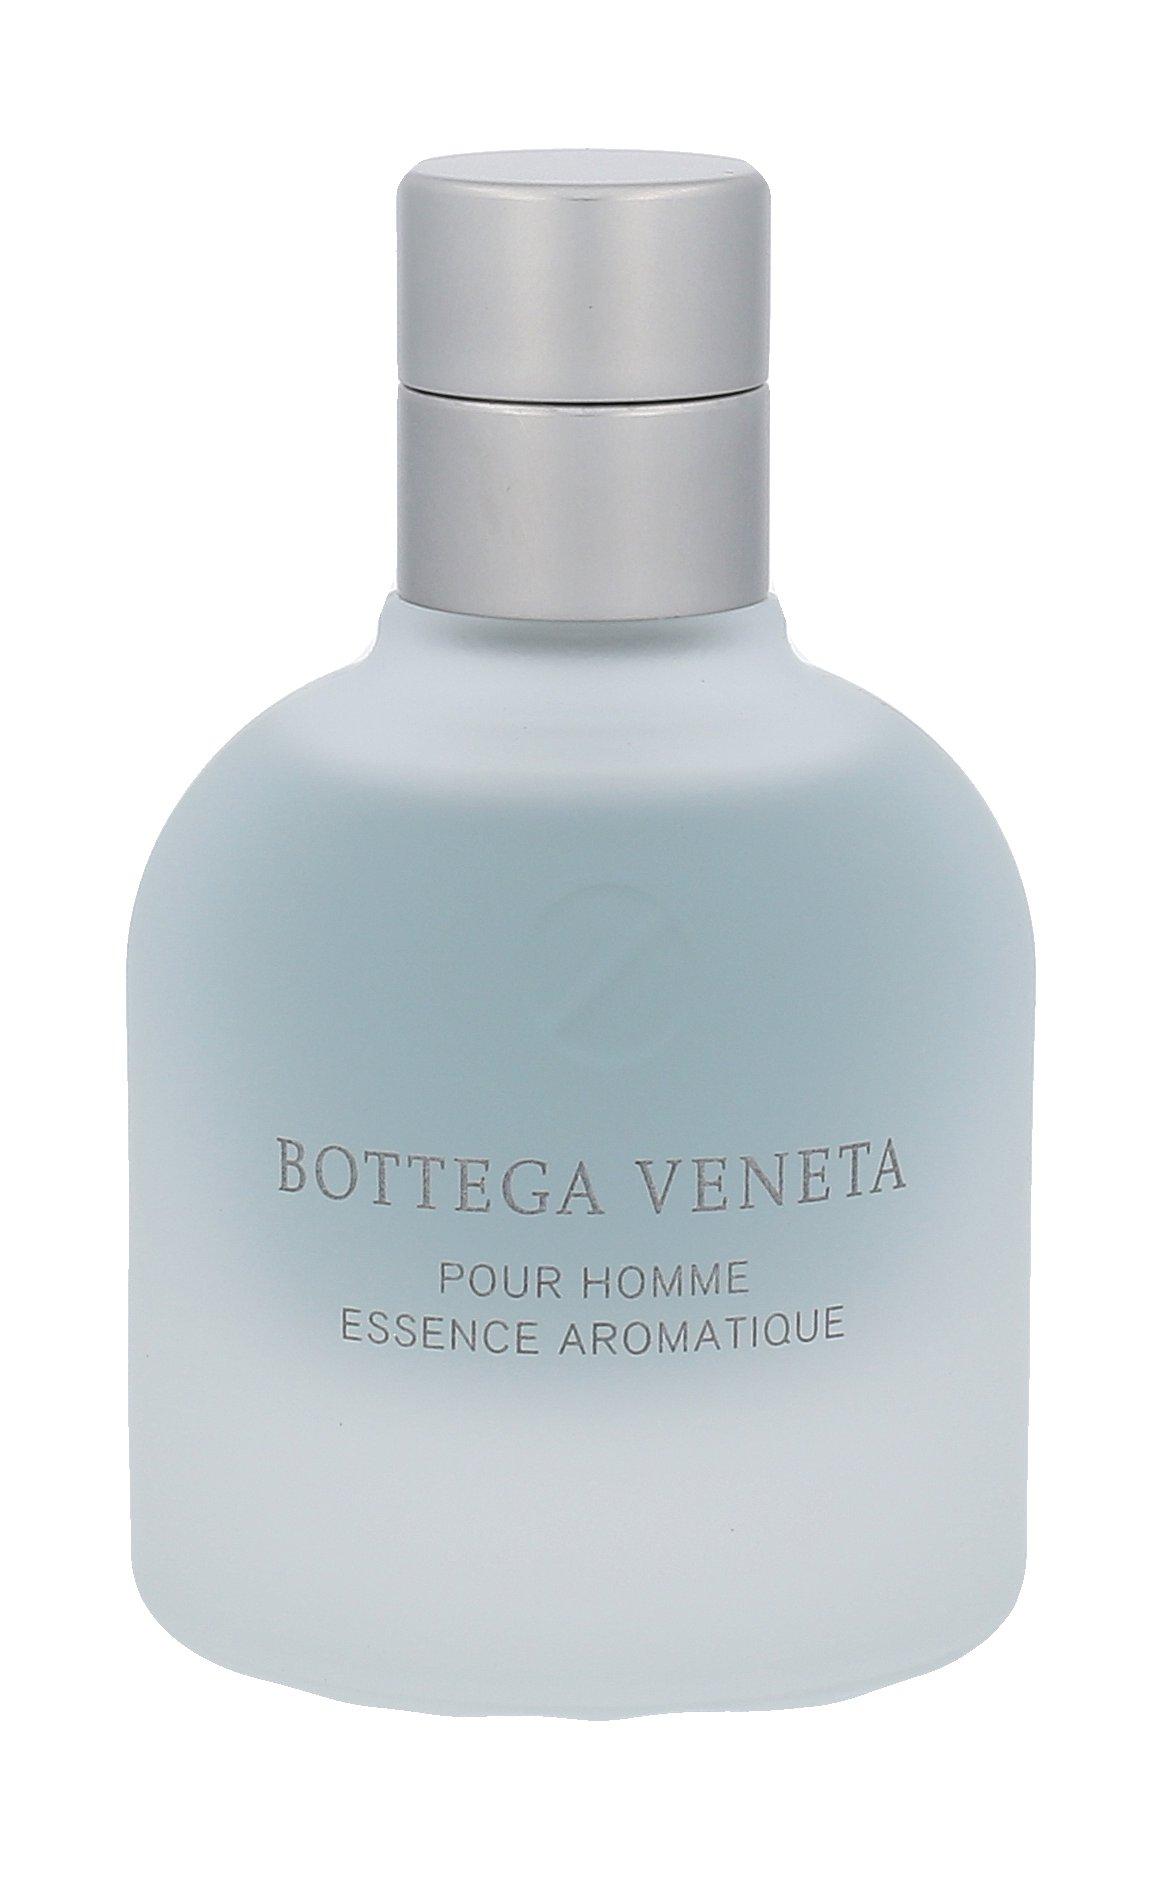 Bottega Veneta Bottega Veneta Pour Homme Essence Aromatique M EDC 50